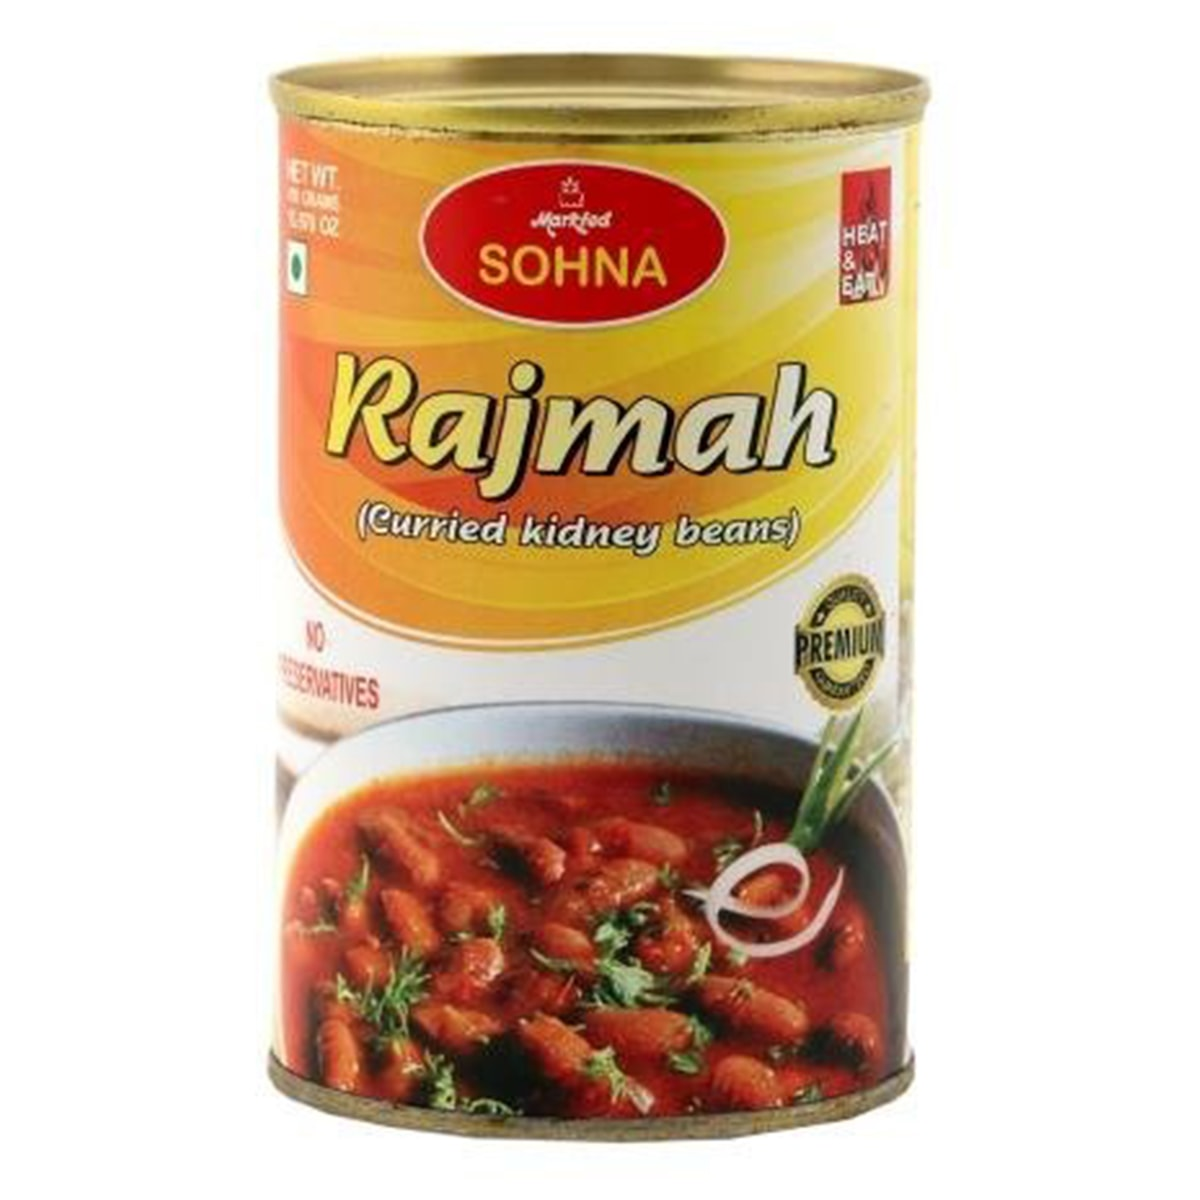 Buy Markfed Sohna Rajmah (Kidney Beans Curry) - 450 gm